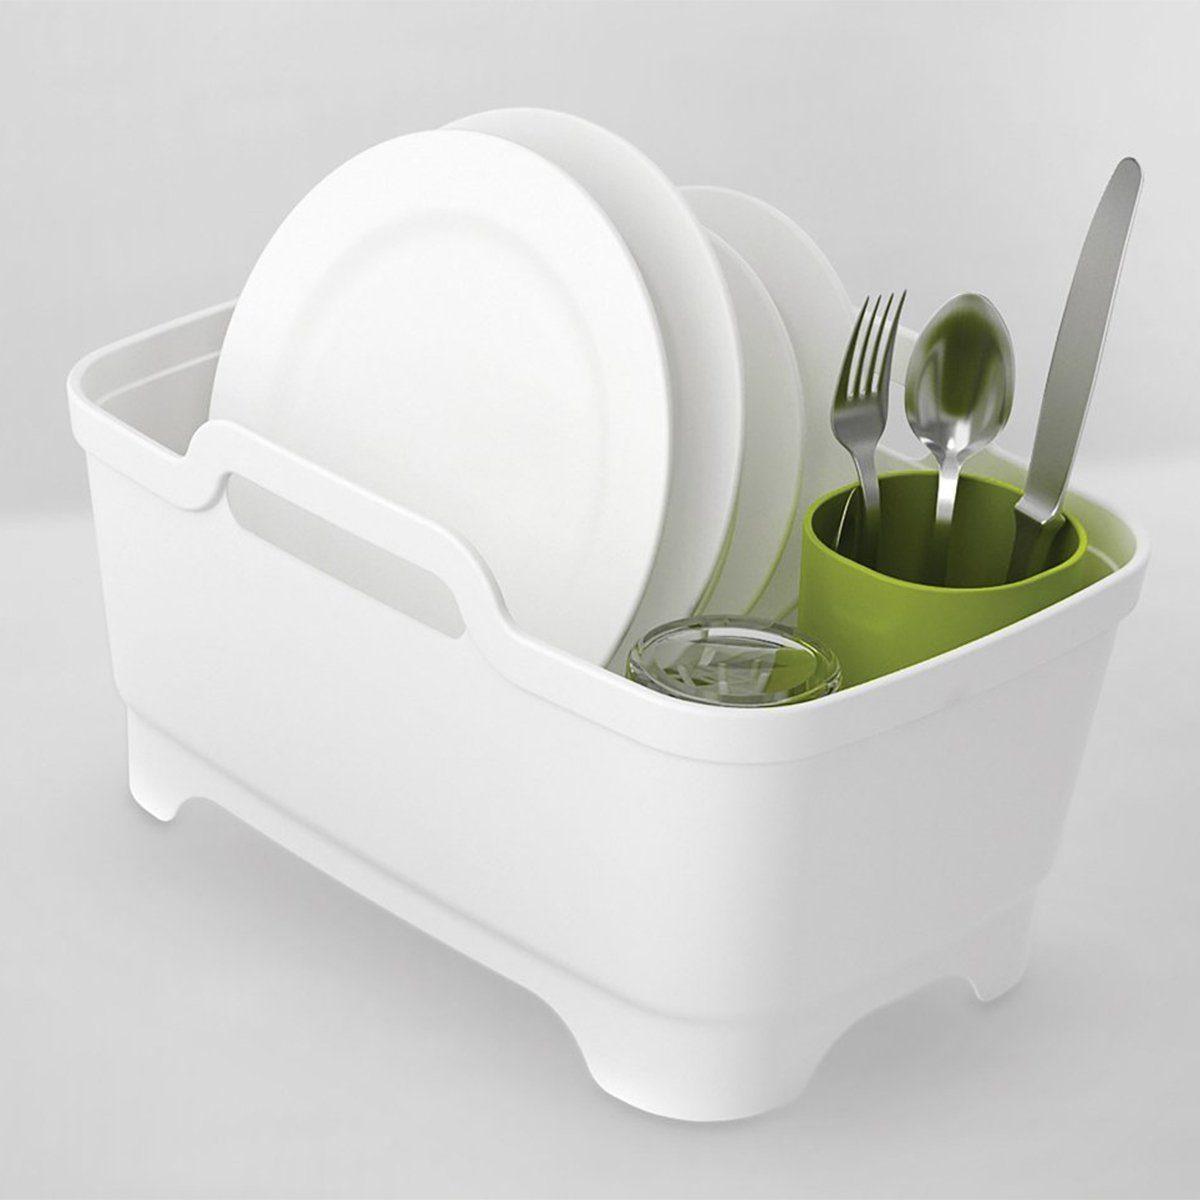 JOSEPH JOSEPH Joseph Joseph Geschirrspülwanne Wash&Drain Plus weiß-grün